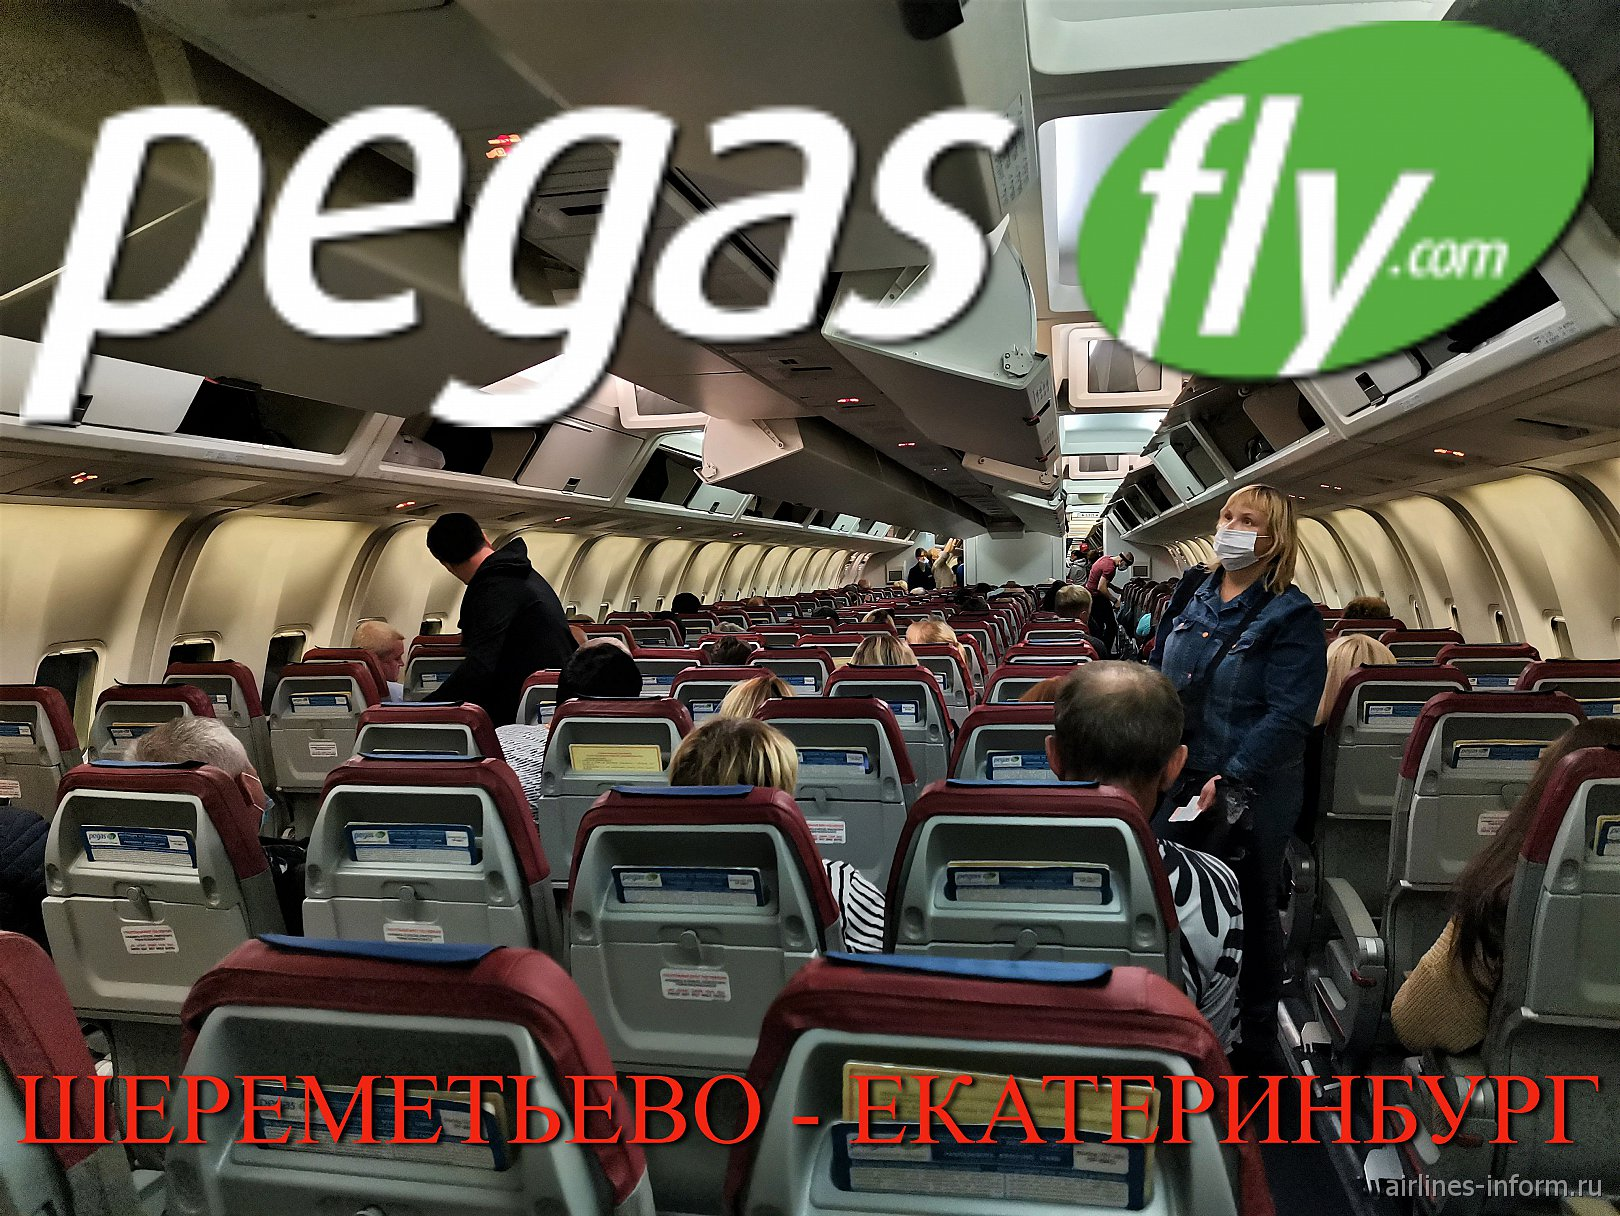 Pegas Fly: Москва - Екатеринбург на Б767-300